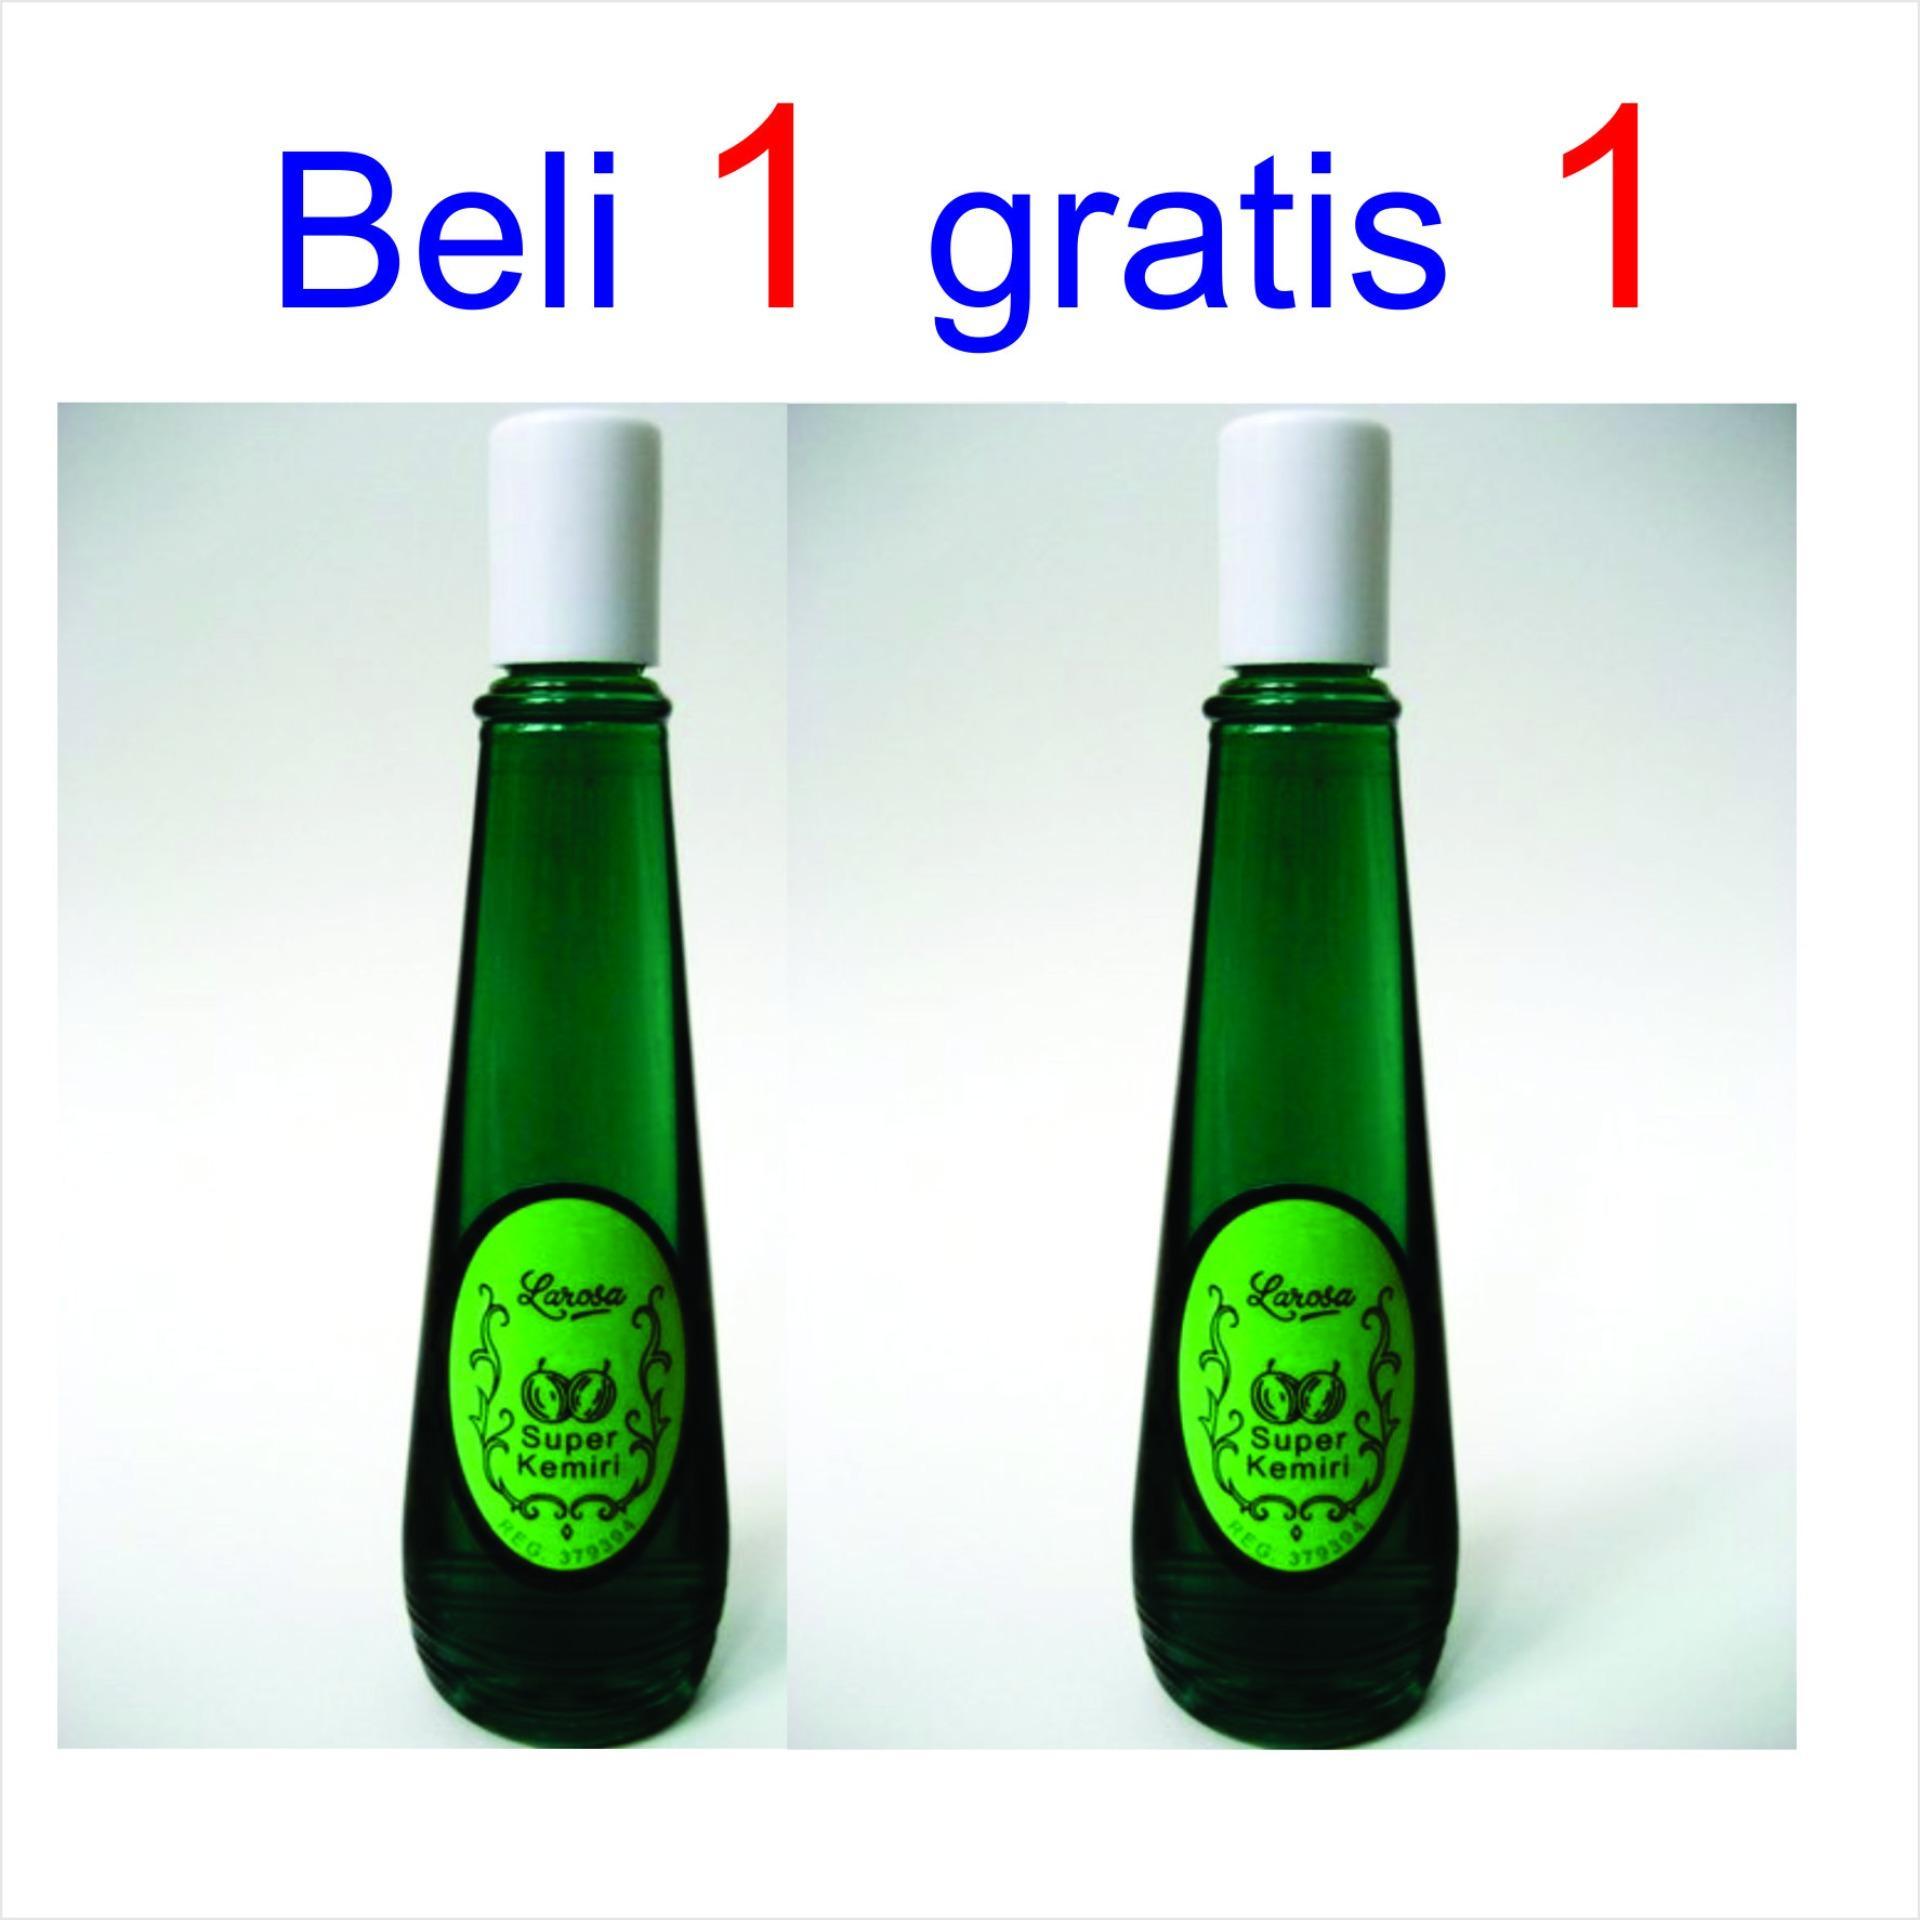 harga penawaran hb minyak kemiri larosa penumbuh rambut - 100ml x 2 Gambar Minyak Kemiri Untuk Rambut